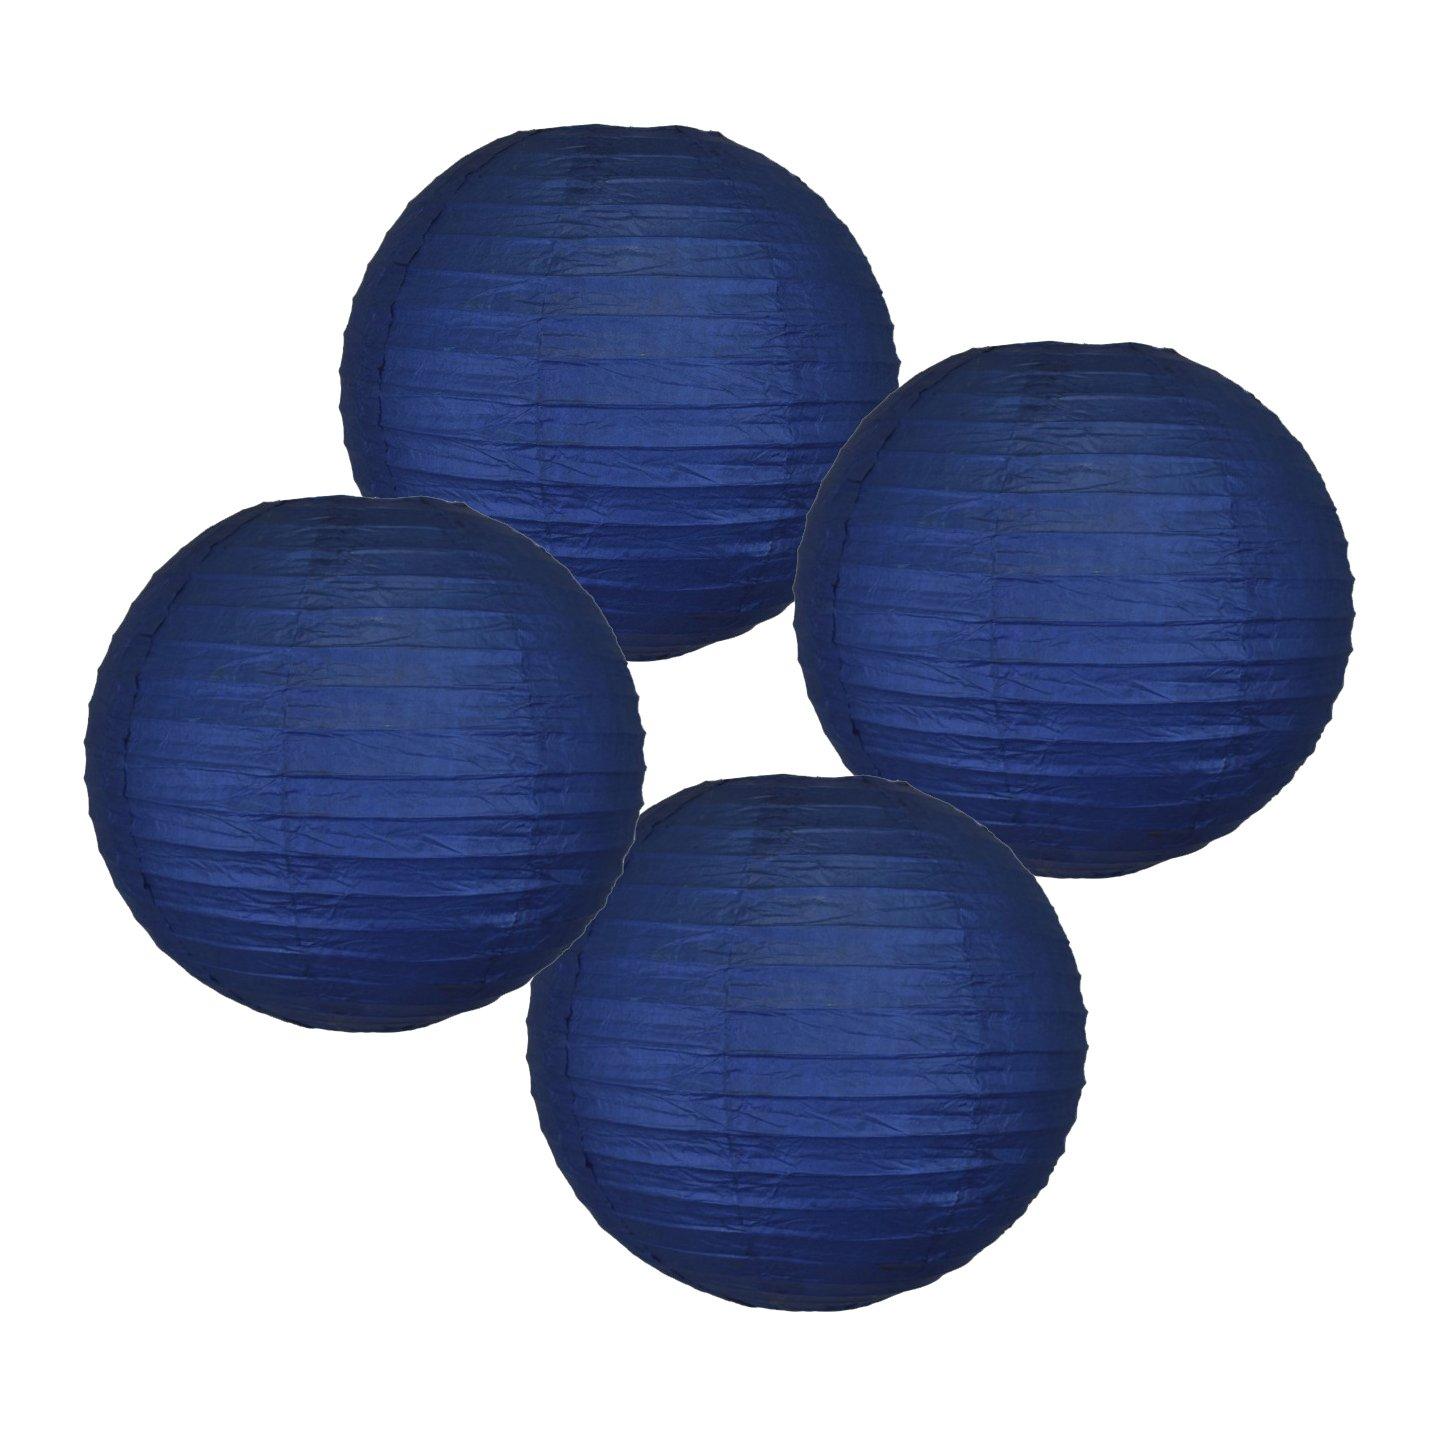 Just Artifacts 様々な紙製ランタン(色とサイズの異なる紙のランタン) 14inch AMZ-RPL4-140017 B01EGXK970 14inch|ネイビーブルー ネイビーブルー 14inch